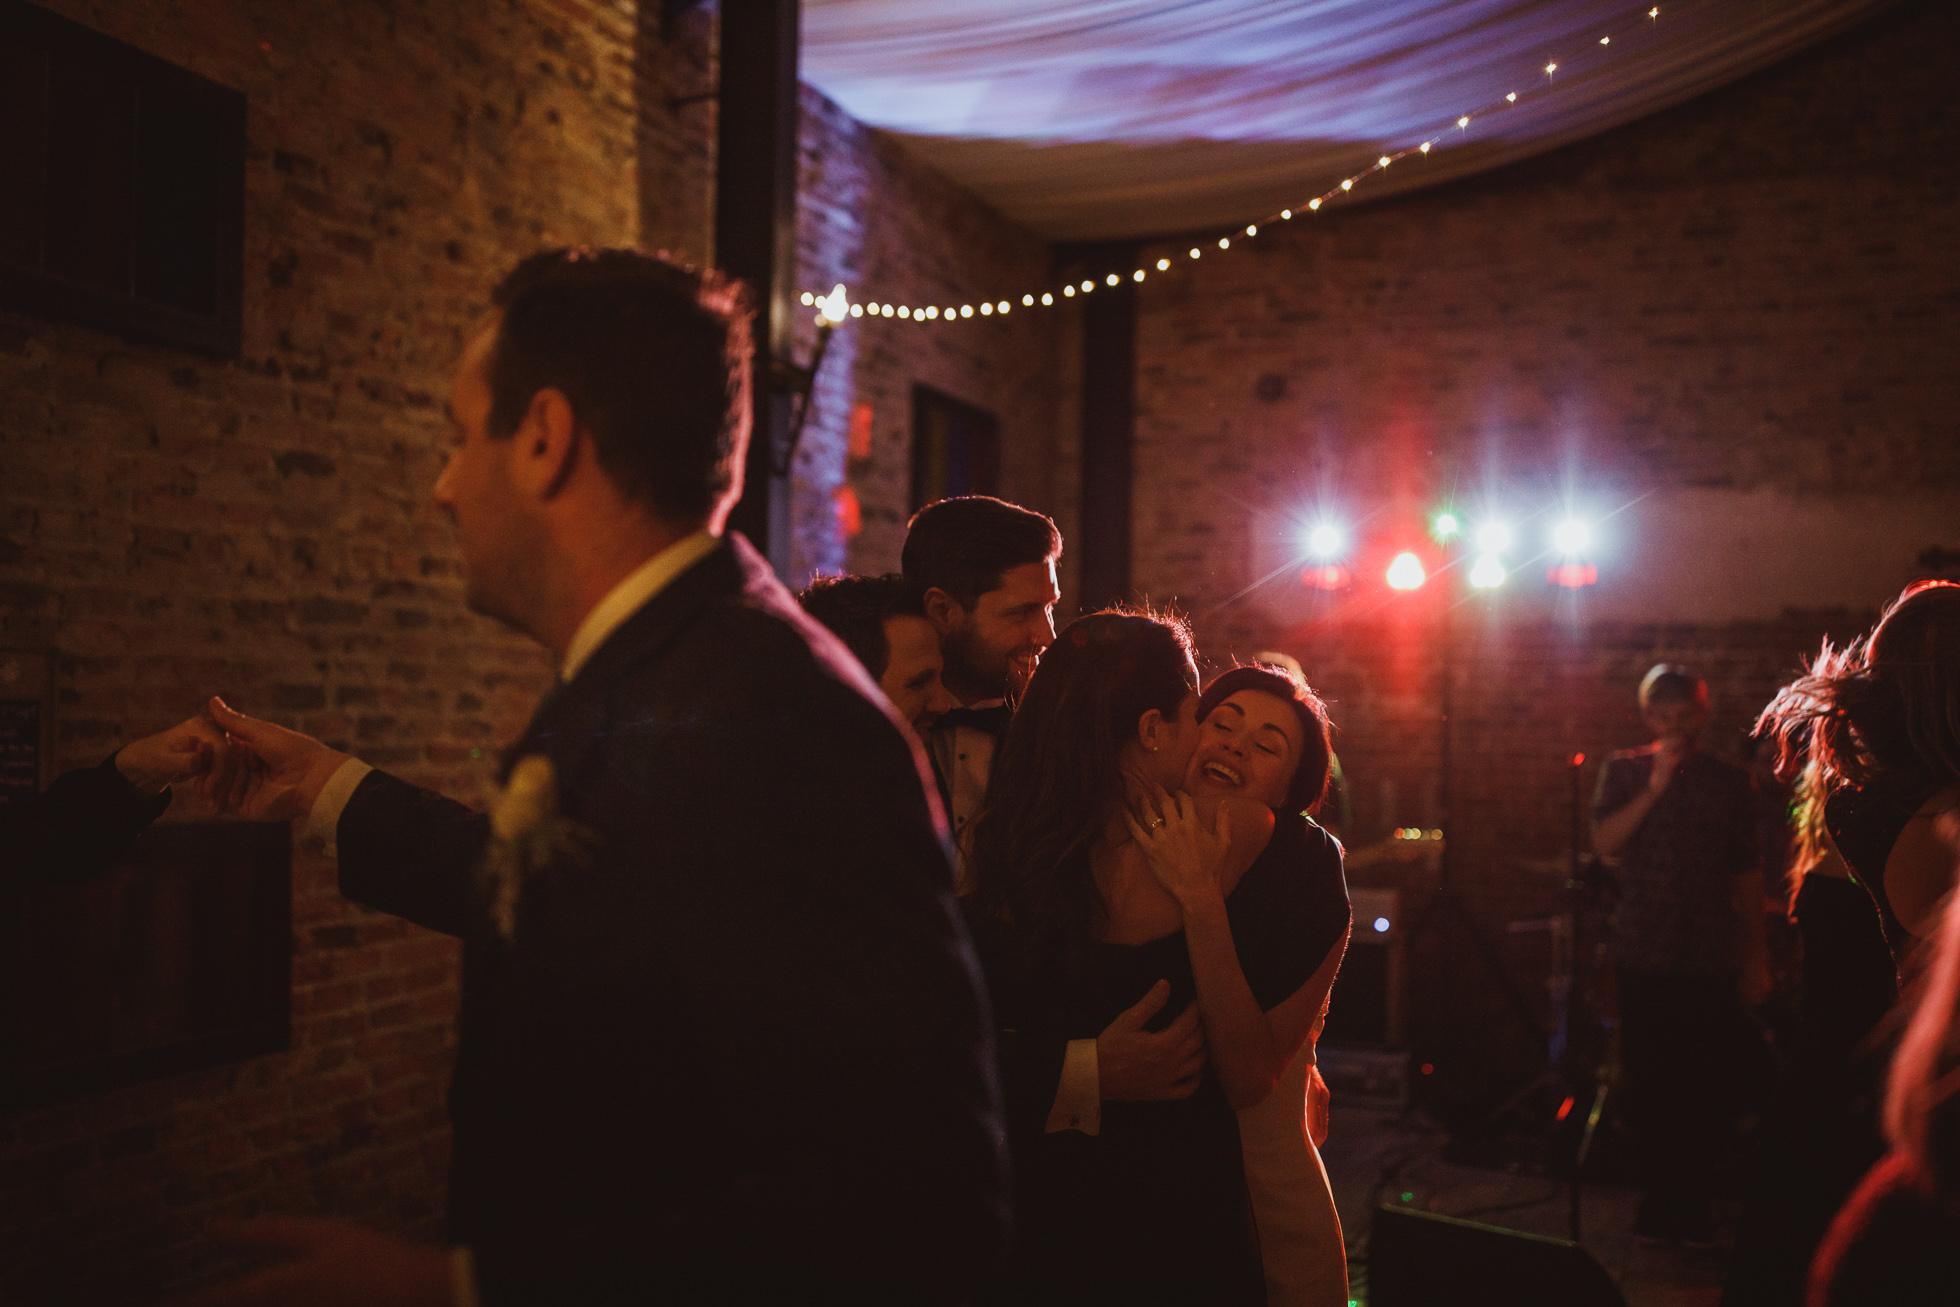 hornington_manor_wedding_photographer-123.jpg